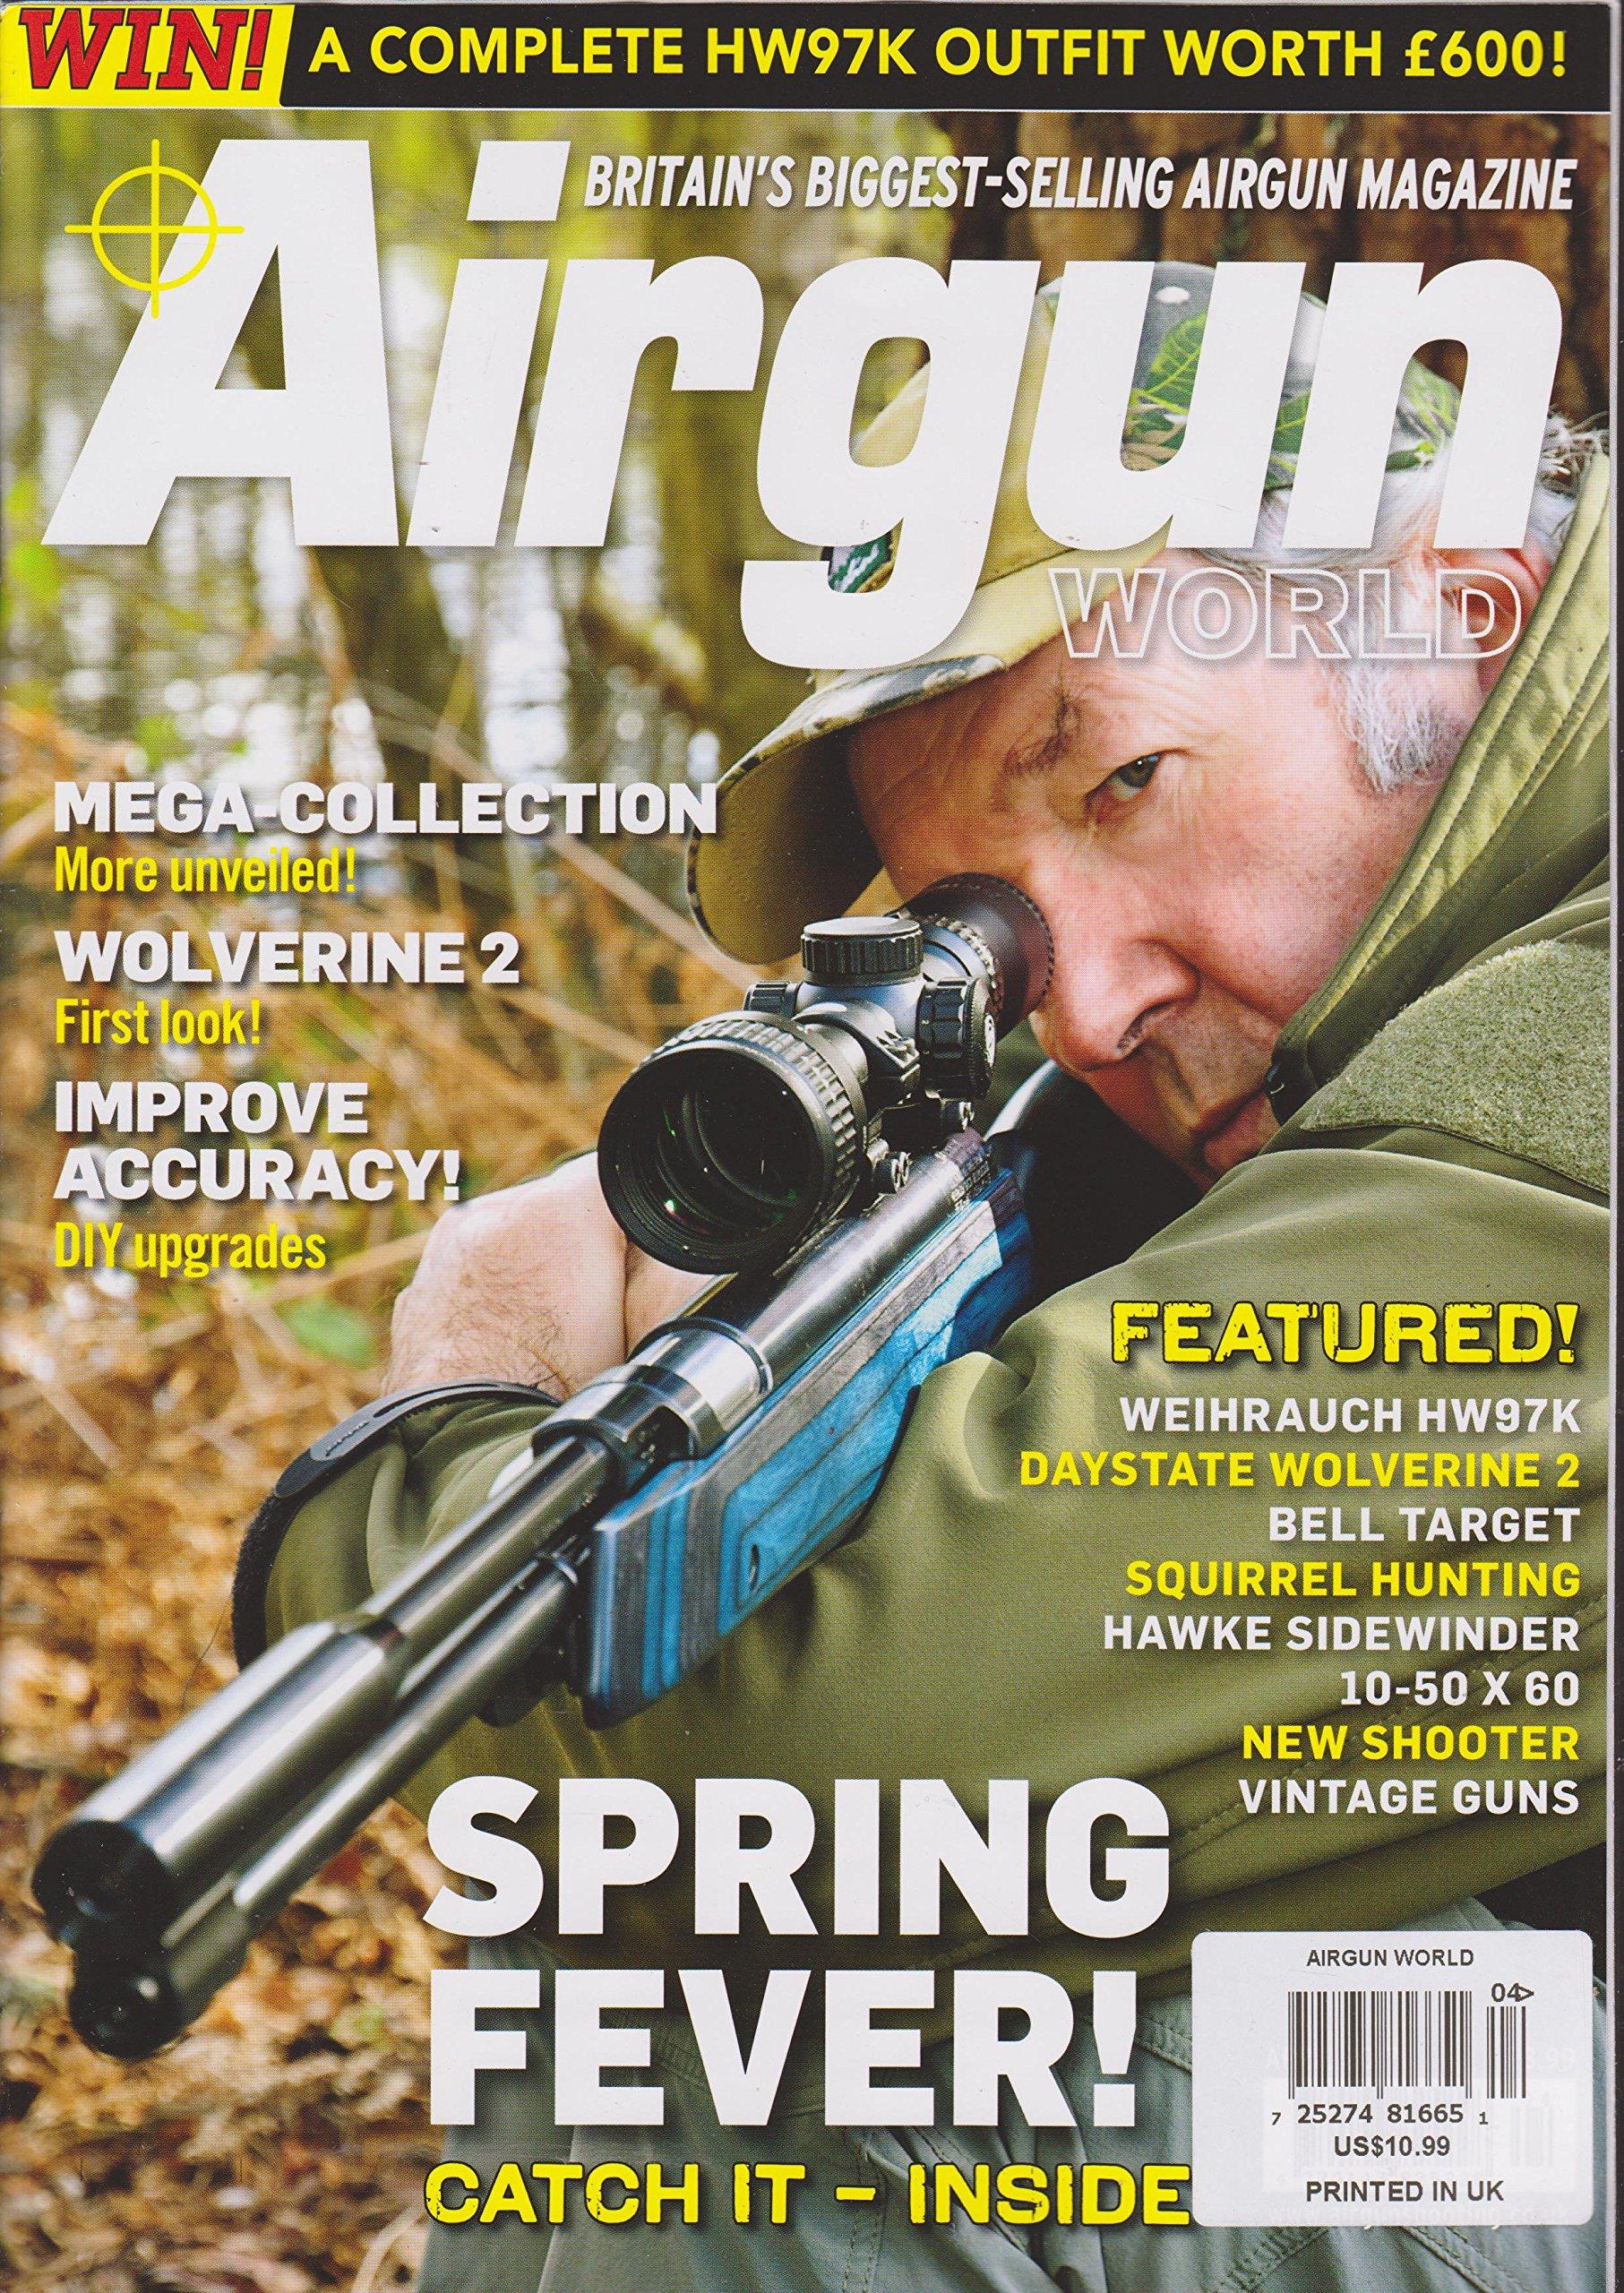 Airgun World Magazine April 2017 ebook